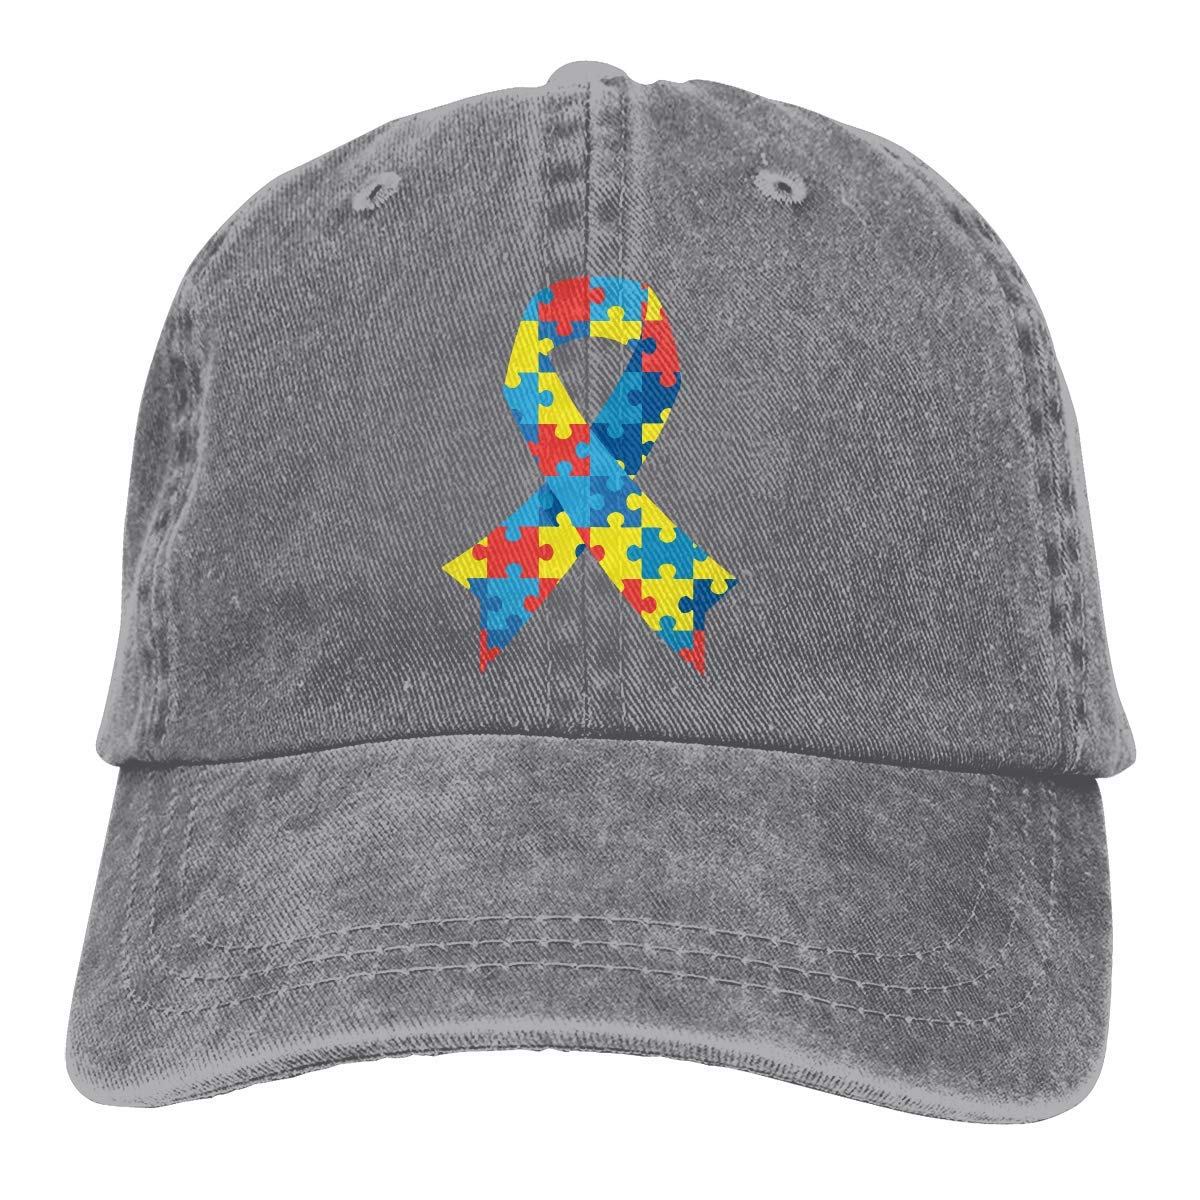 KLing Baseball Hat for Unisex, Autism Awareness Fashion Cotton